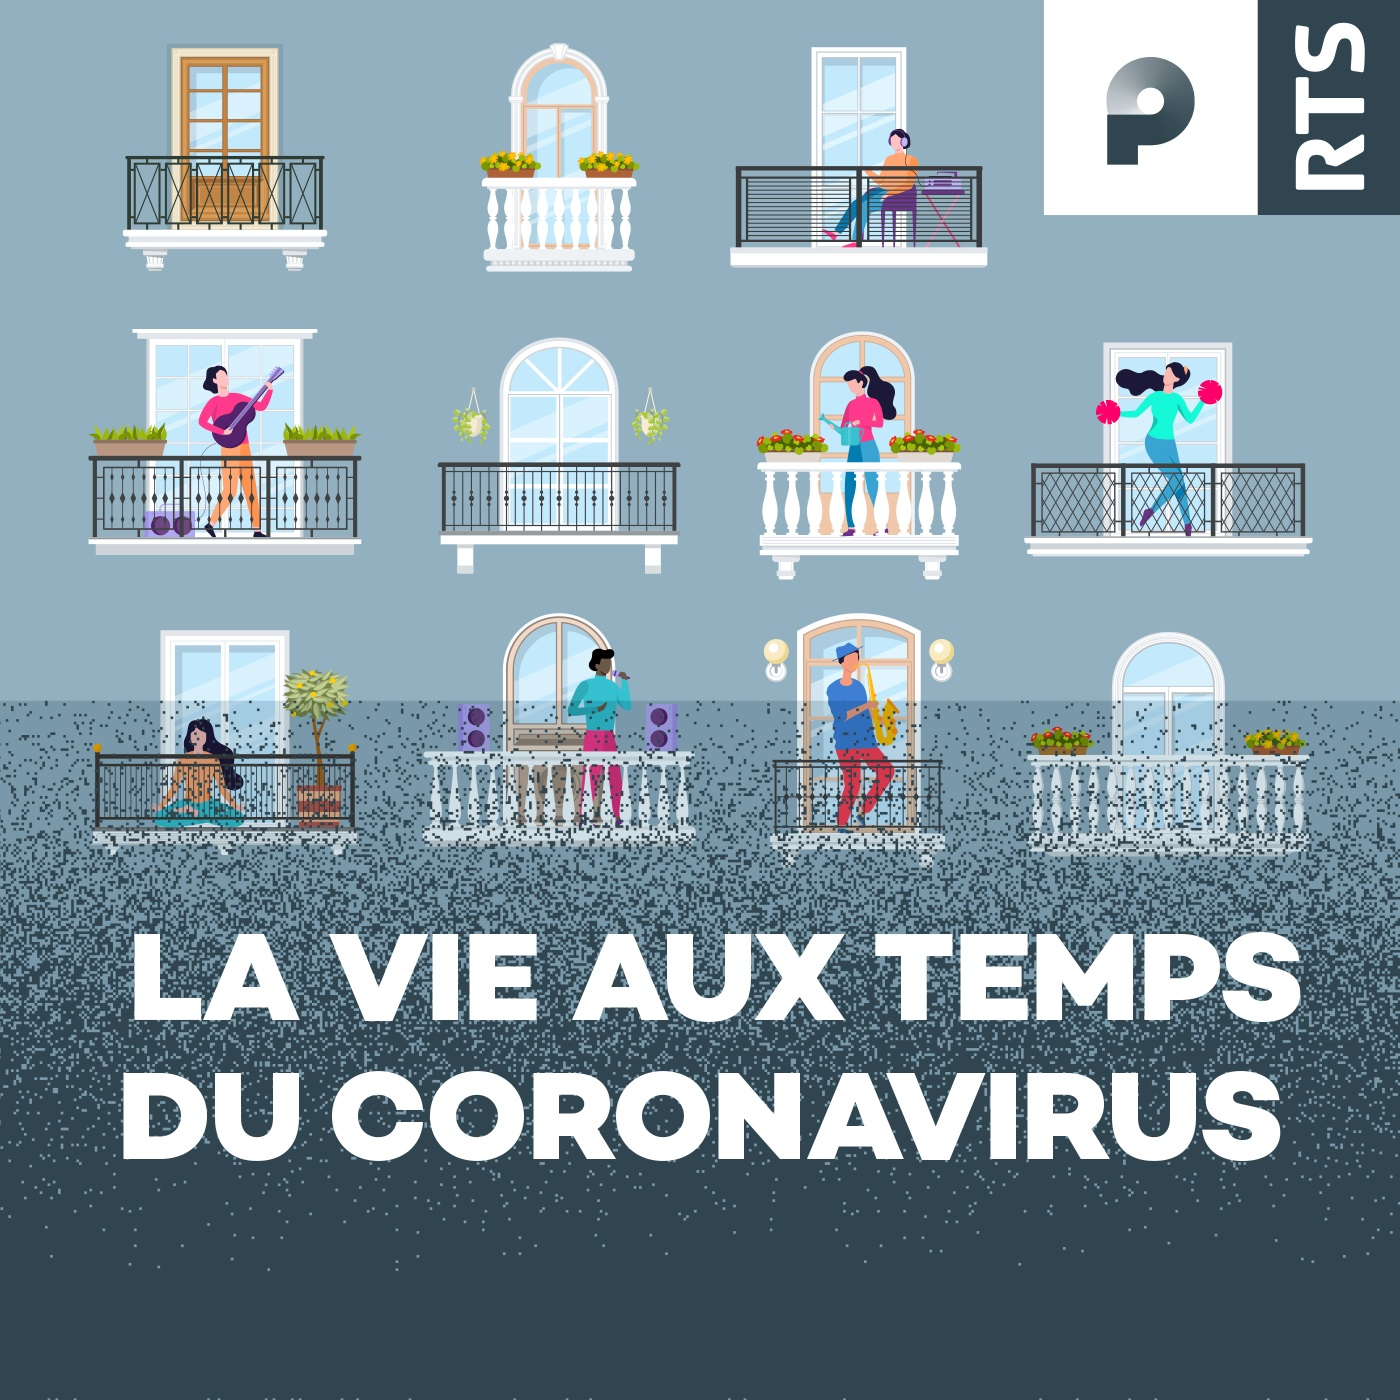 La vie aux temps du coronavirus (Logo) [RTS]